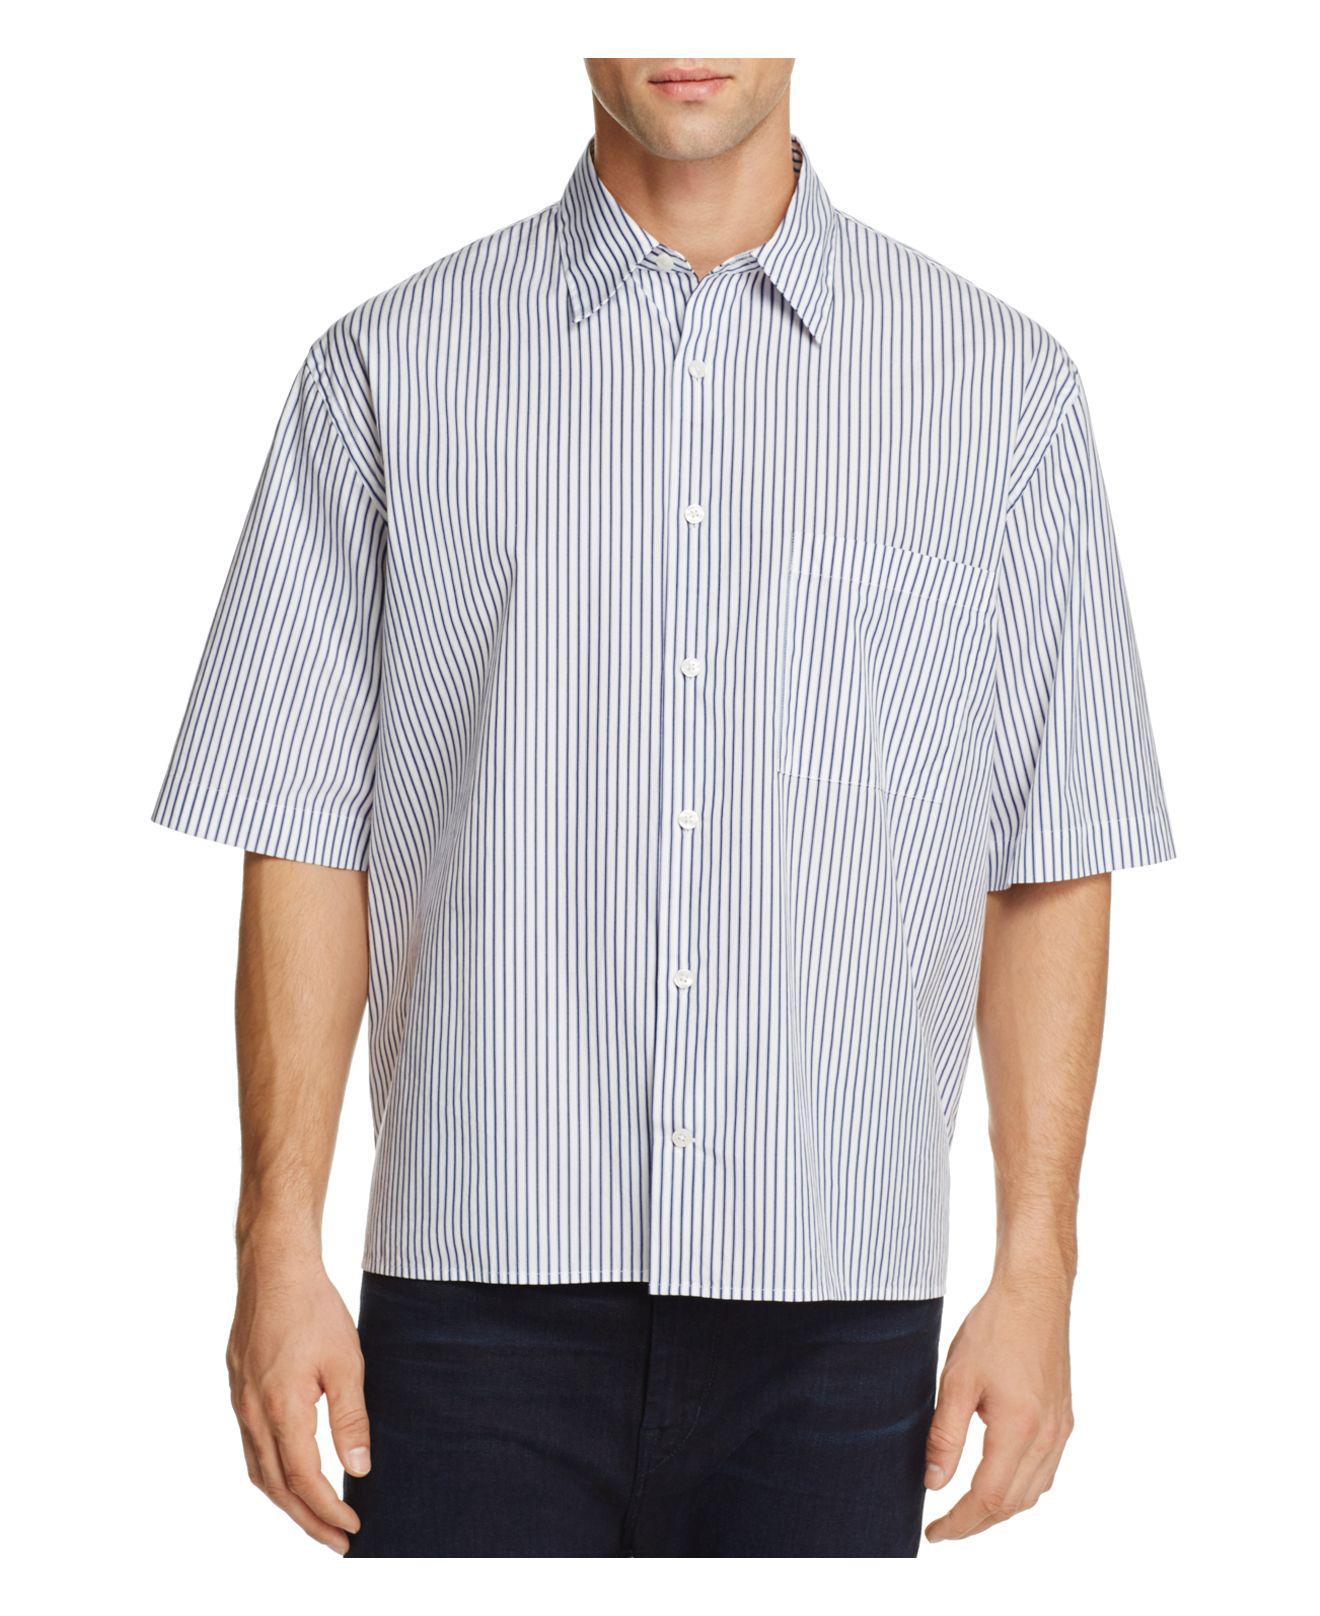 Visit New Sale Online Boxy Pinstripe Button-Front Shirt Vince Footlocker Pictures Cheap Price Sale Perfect Cheap Sale Official Site Buy Cheap 2018 8CU2Gr0U